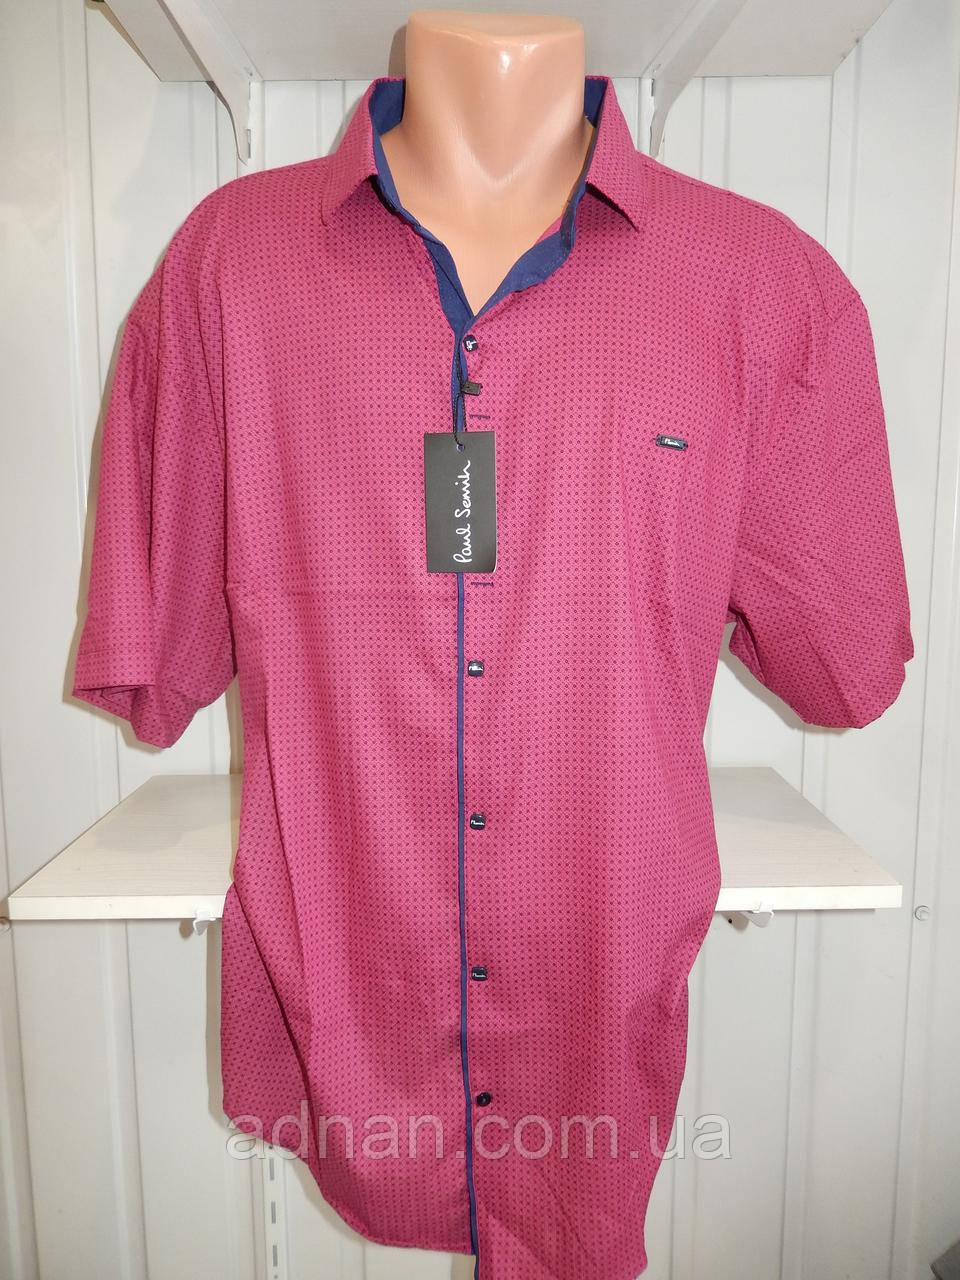 Рубашка мужская Paul Smith супербатал, короткий рукав, стрейч, заклёпки 20.05.2018№1 009\ купить рубашку